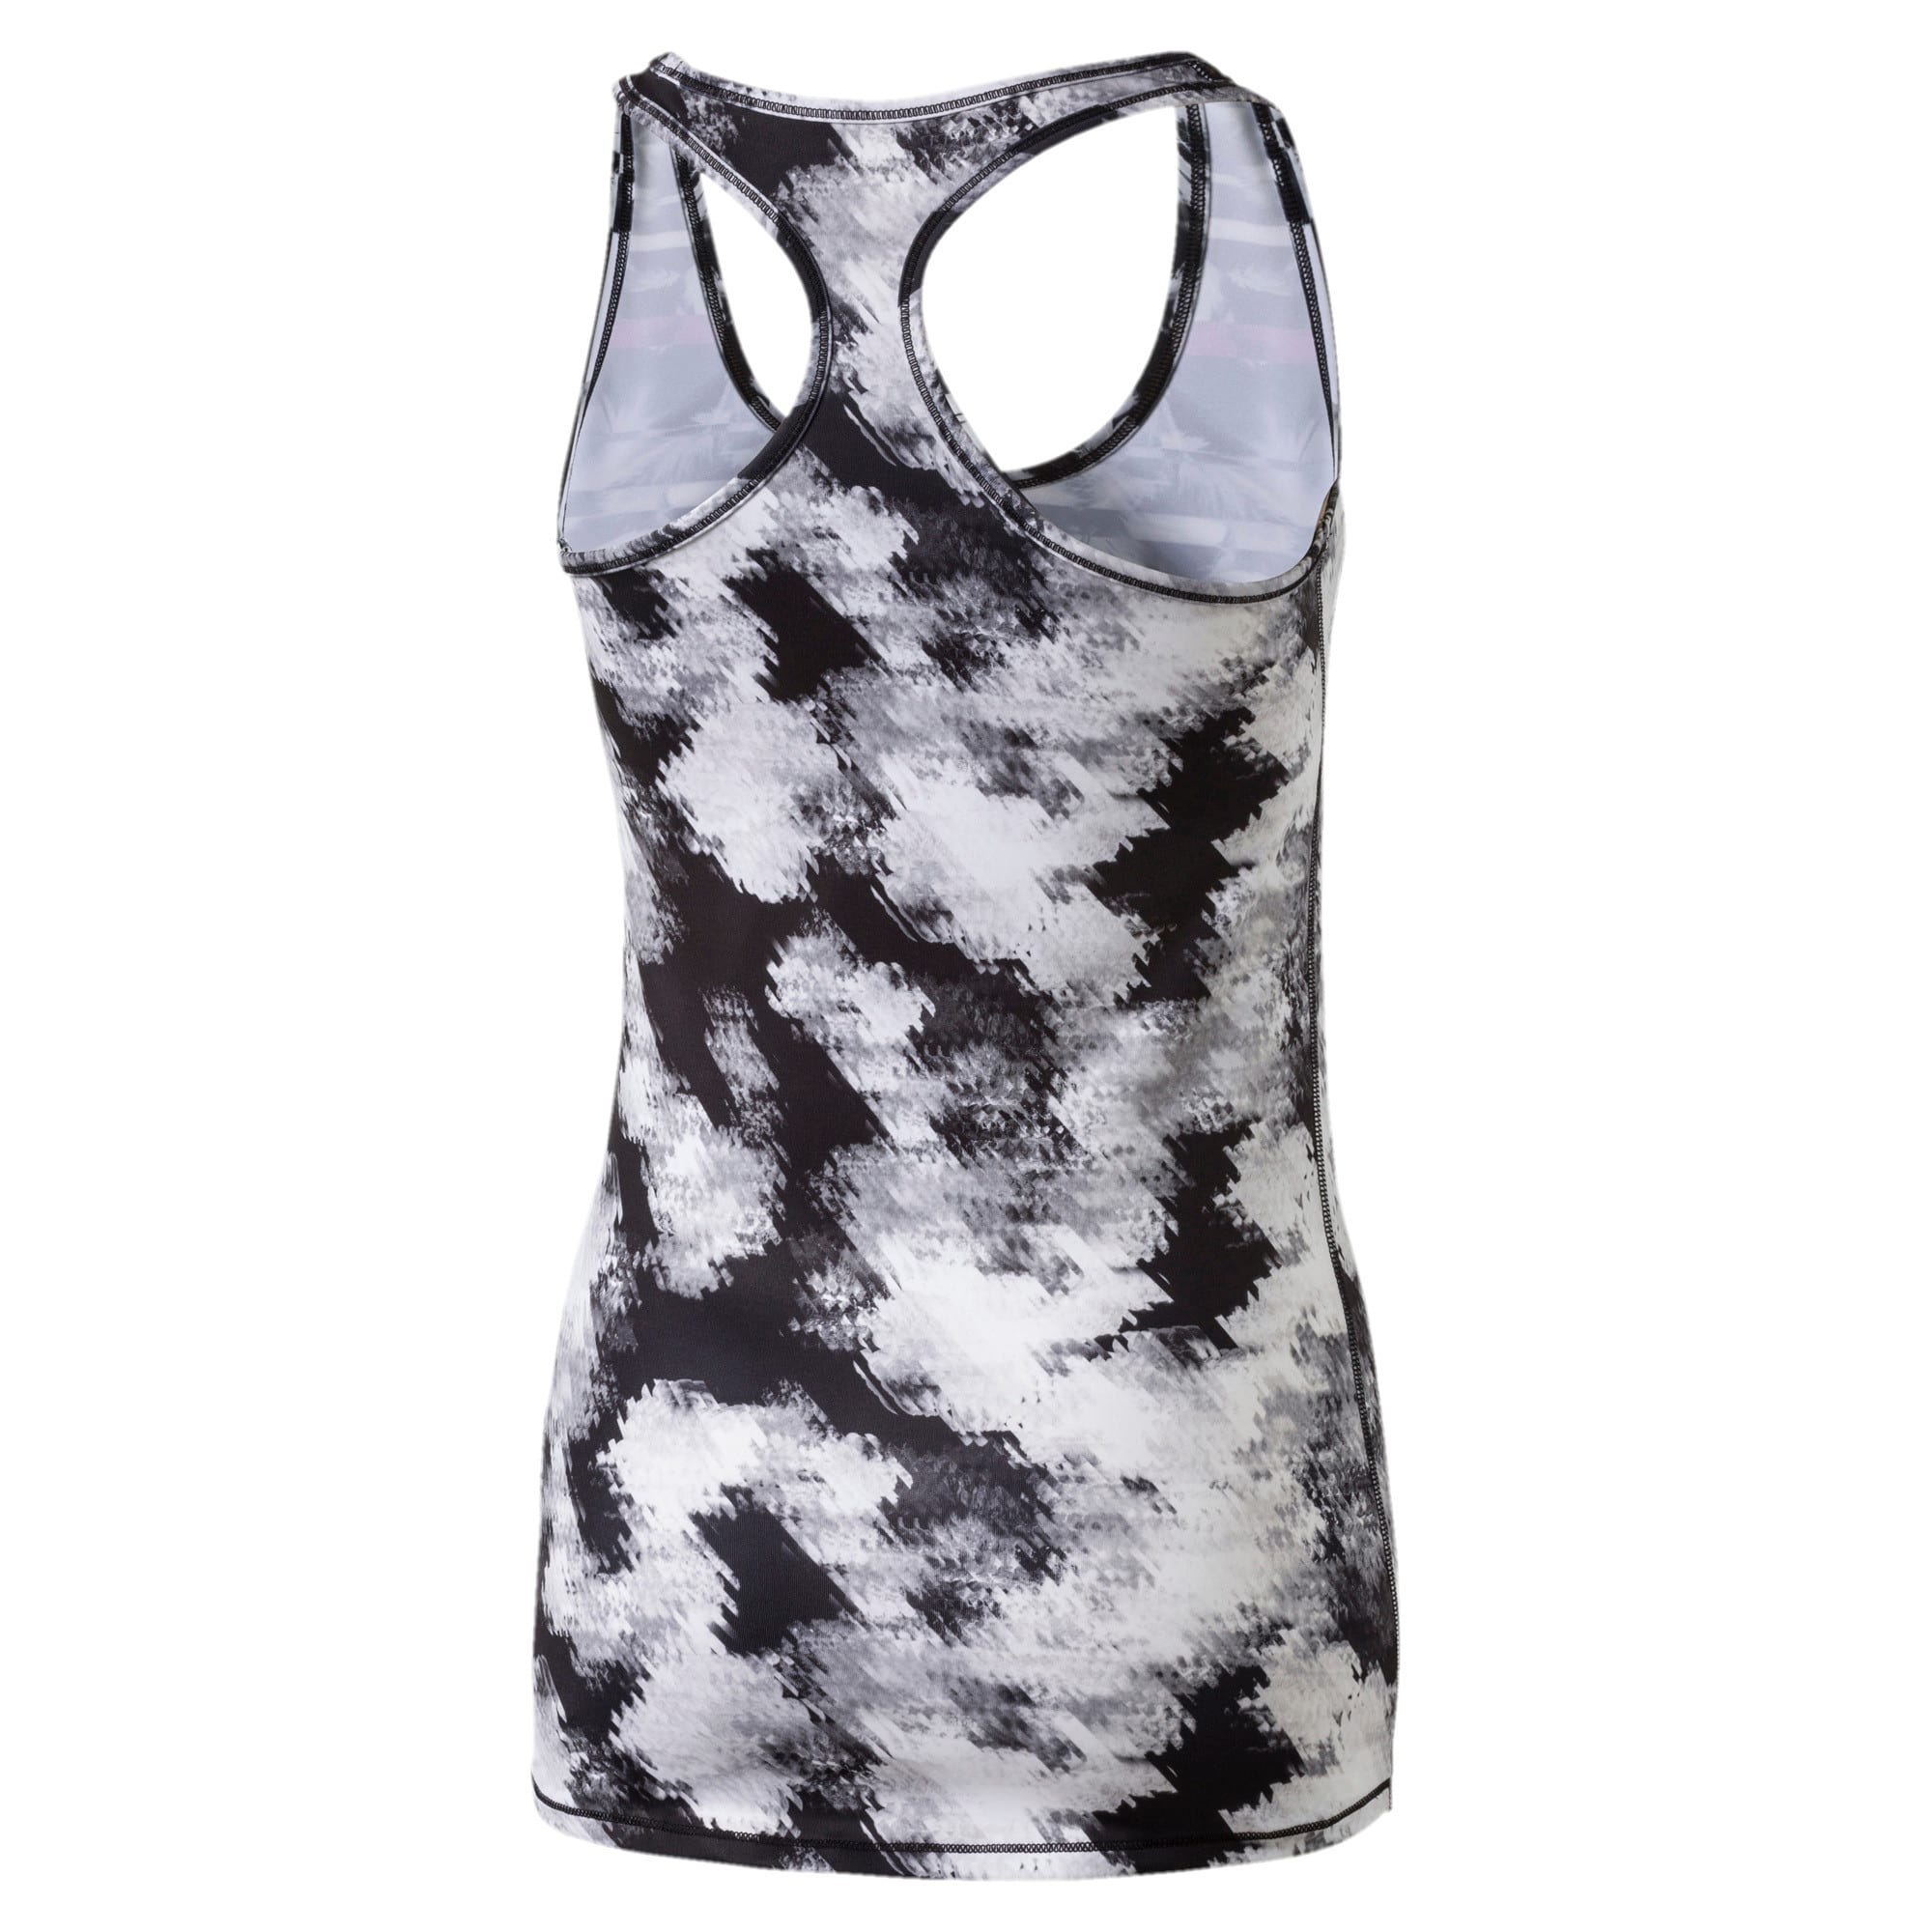 Thumbnail 4 of Training Women's Essential Layer Graphic Tank Top, puma black-white explosv pt, medium-IND